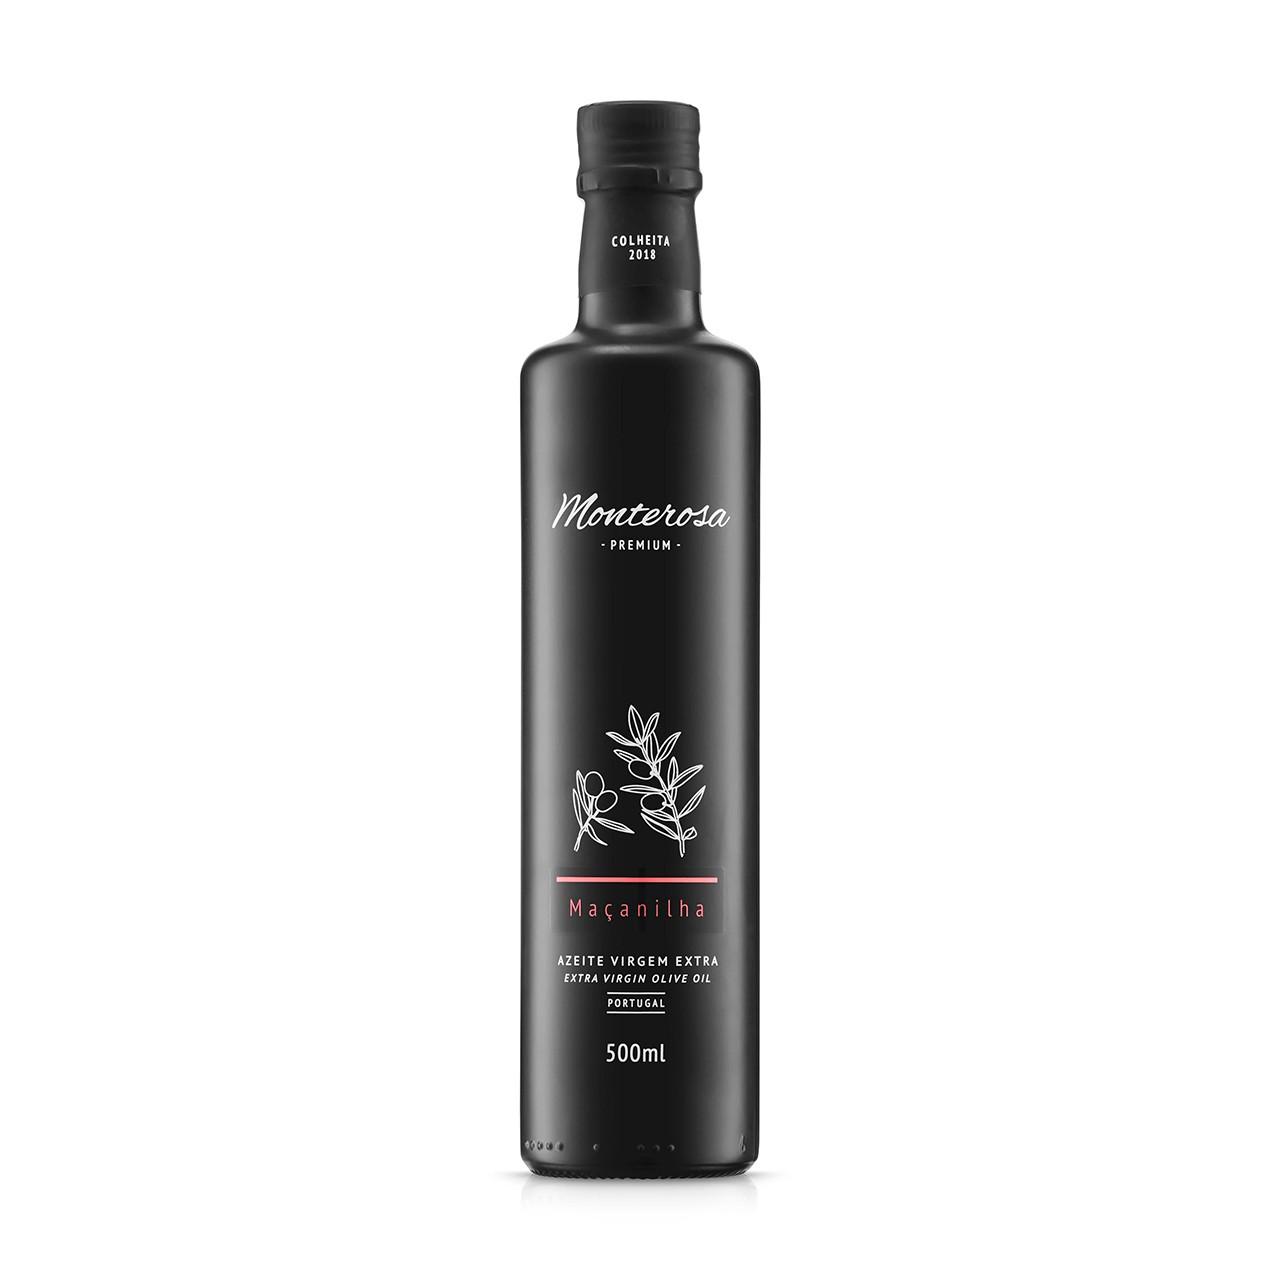 Macanilha Superior Monterosa oliwa extra virgin 500 ml